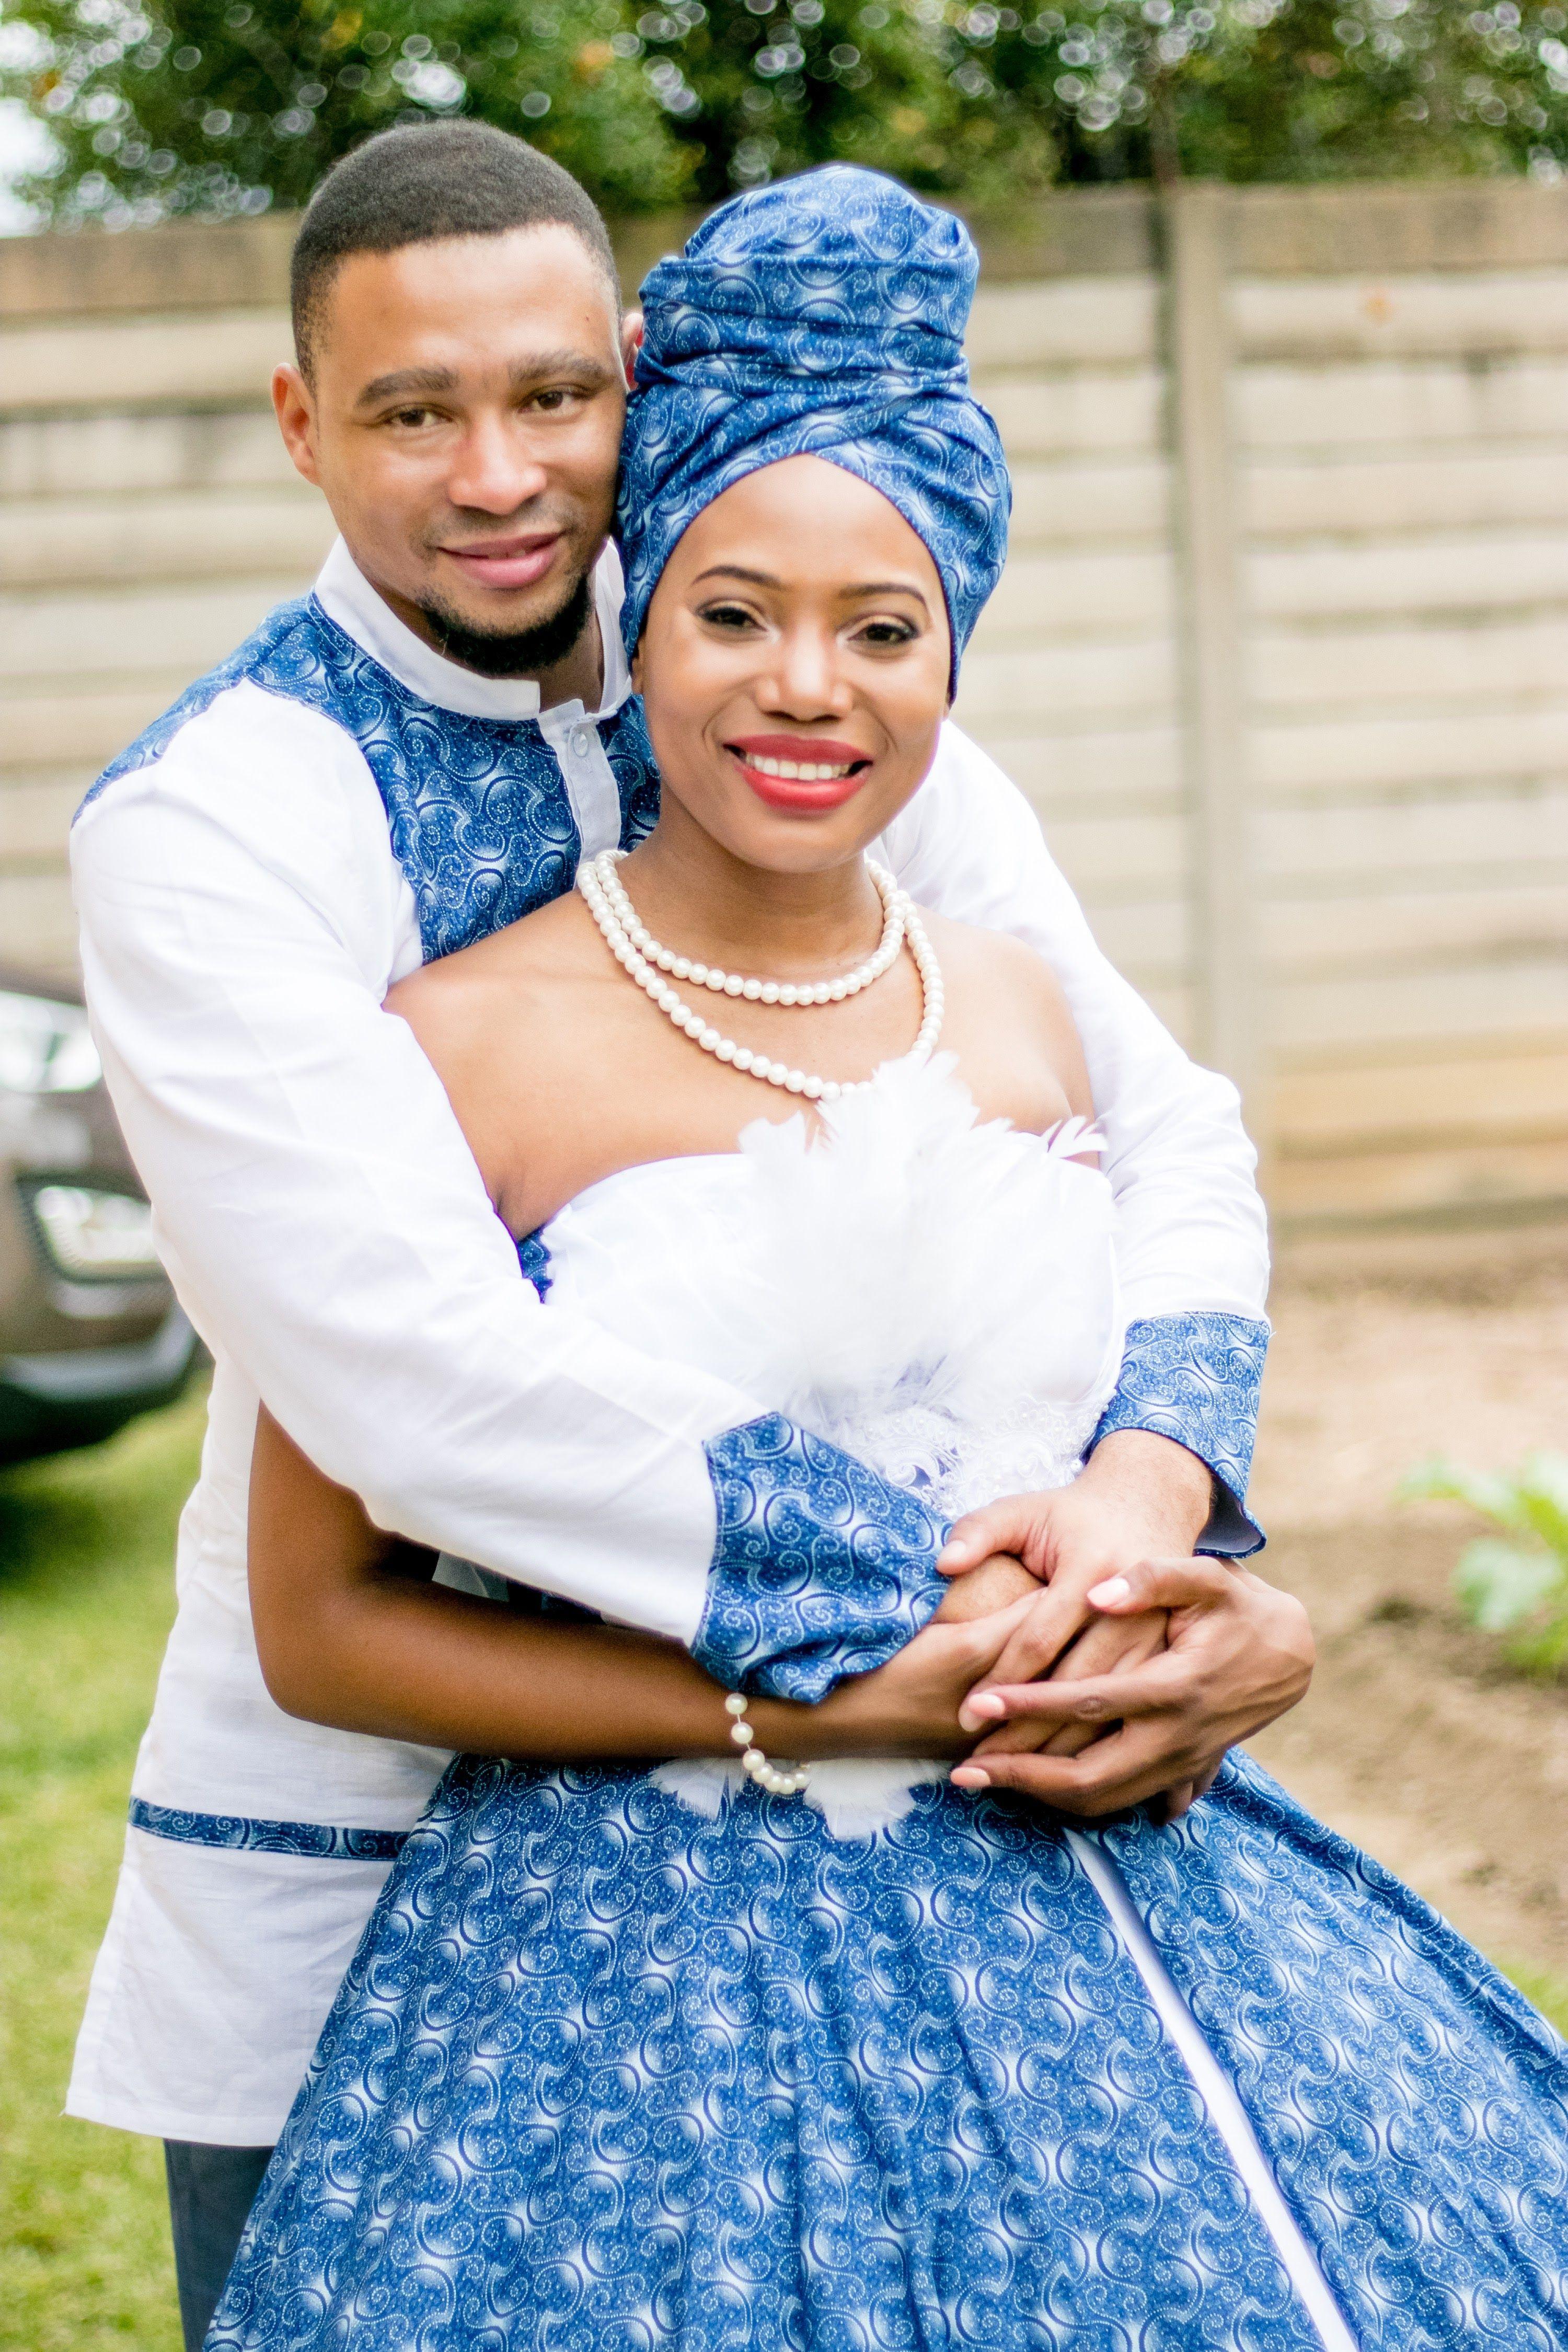 South African wedding dress, Tshwana African couple